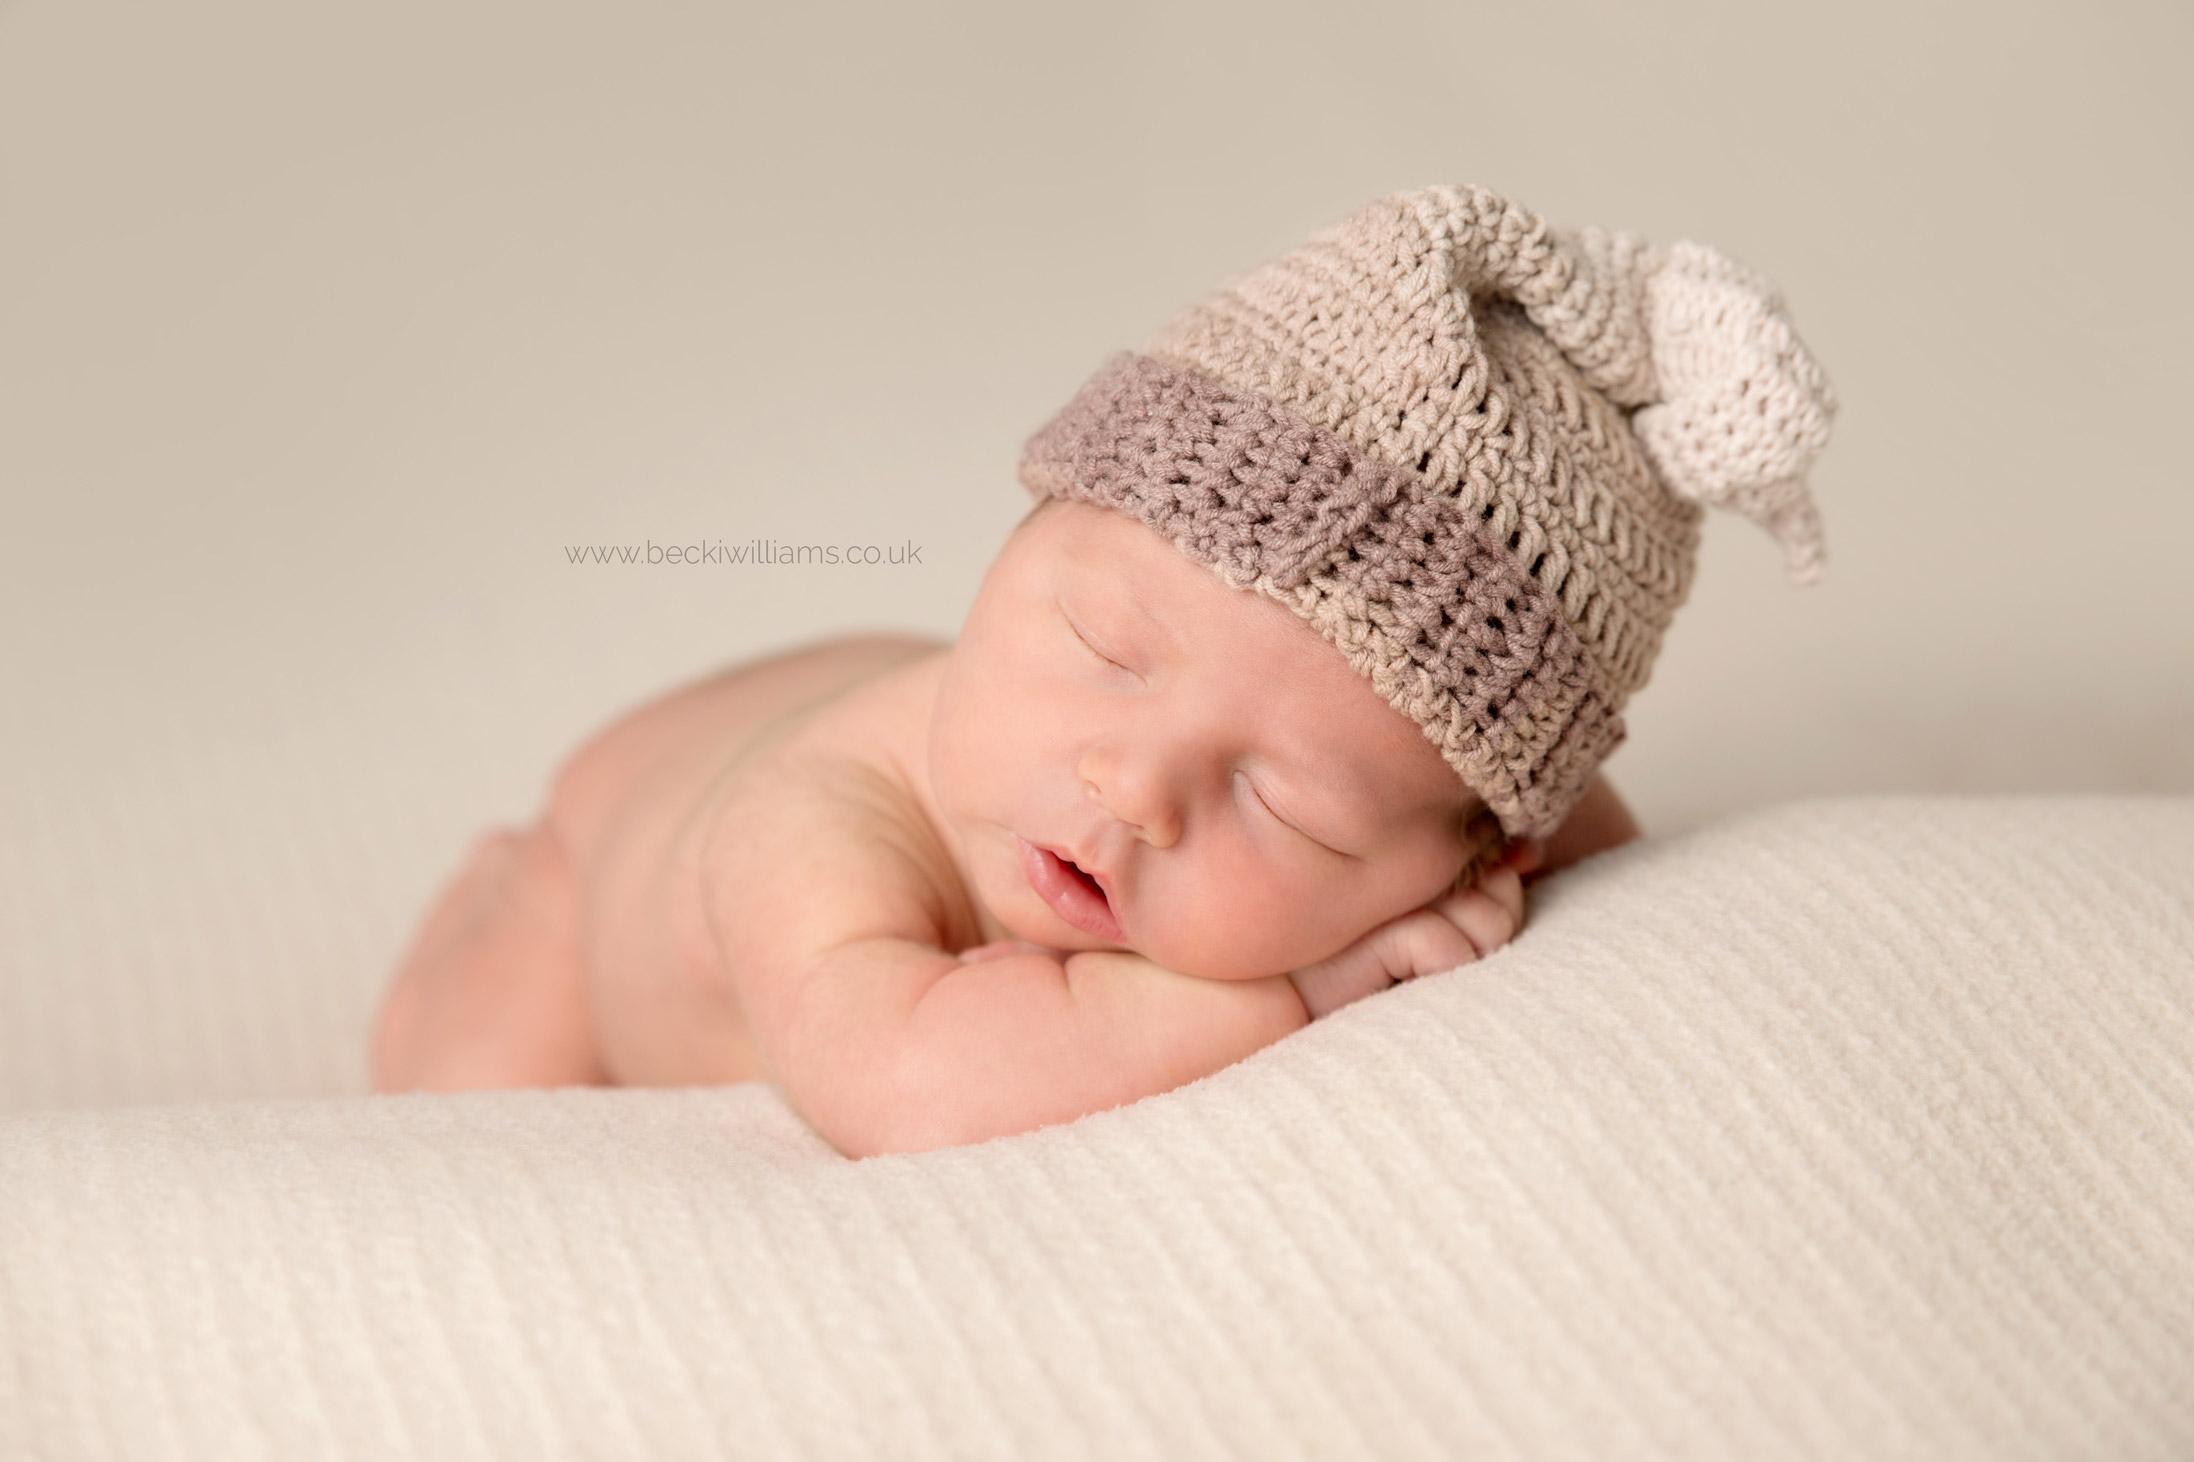 Newborn Photography hemel hempstead - sleeping baby - hat or not hat